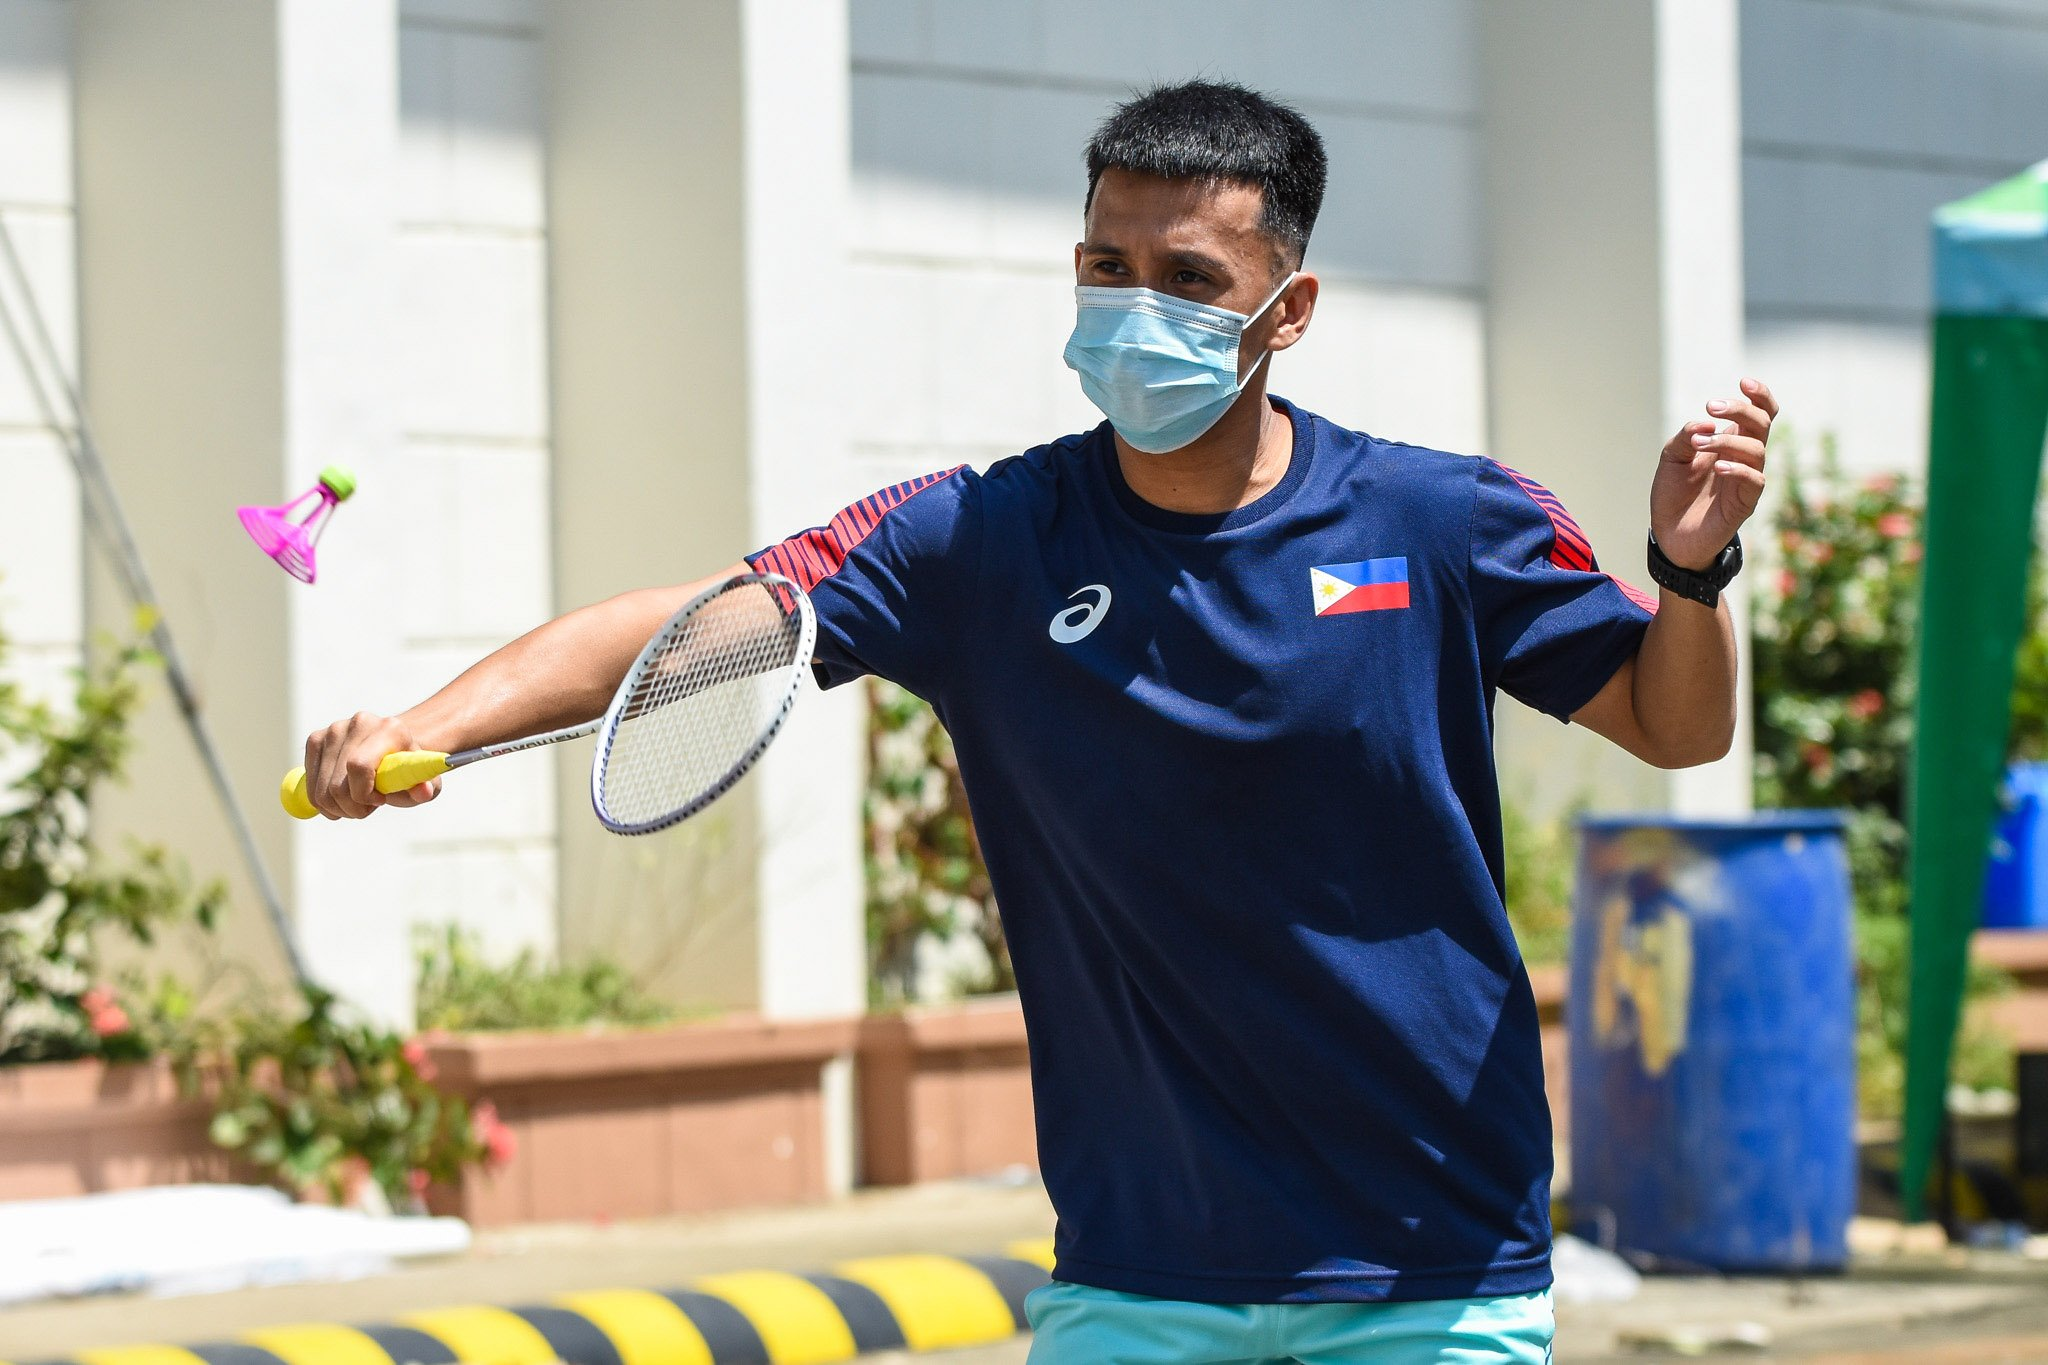 Airbadminton-Ros-Pedrosa Smash Pilipinas' Pedrosa, Barredo try airbadminton Air Badminton News  - philippine sports news